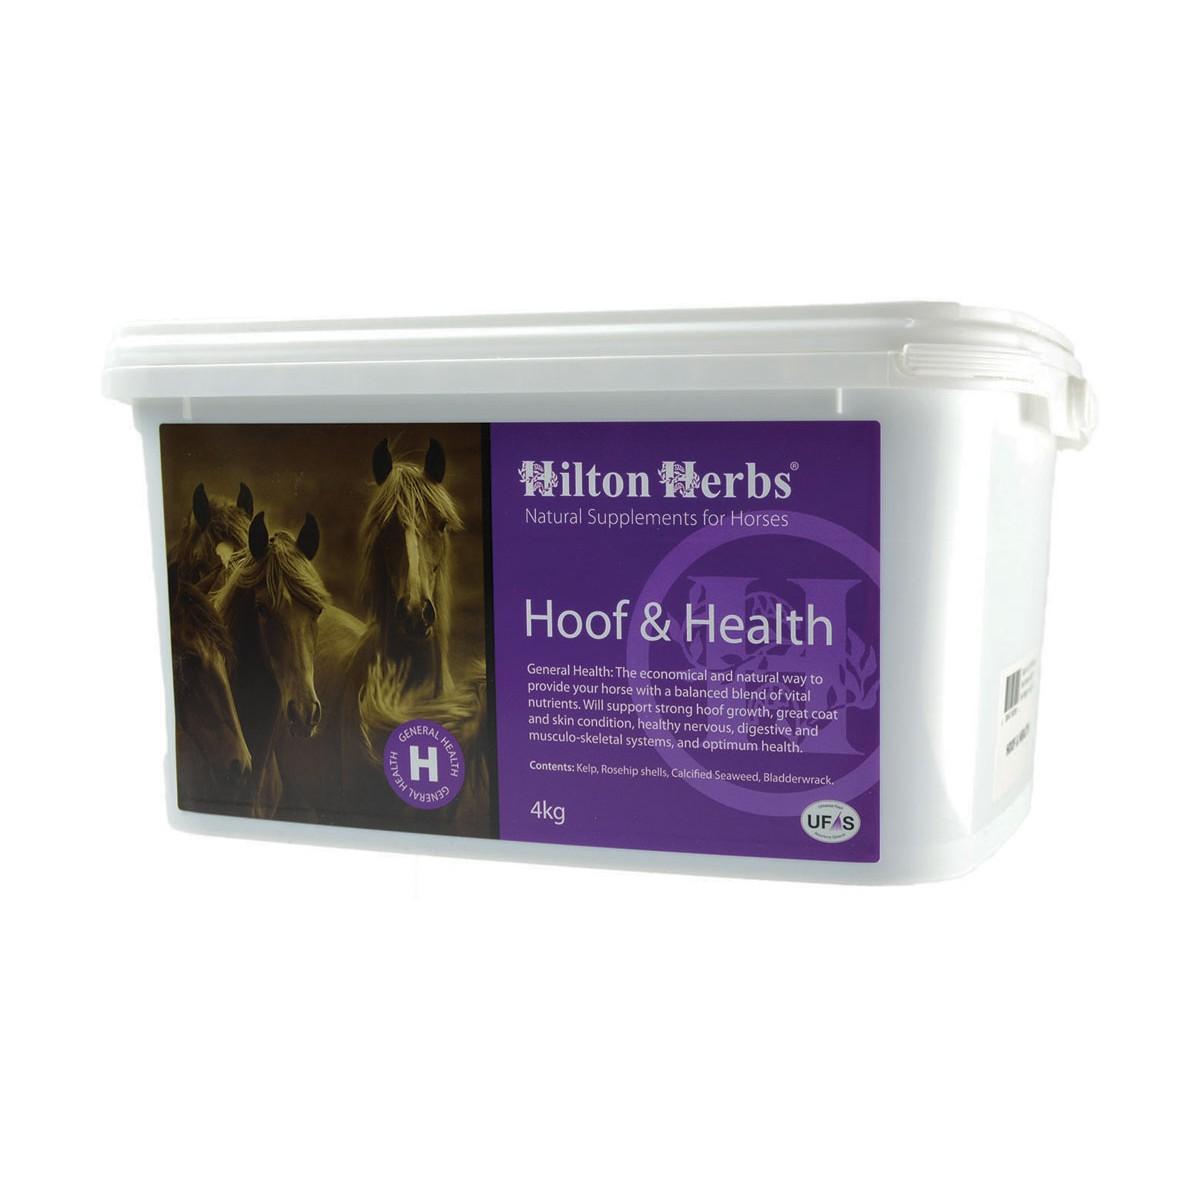 Hilton Herbs Hoof & Health Supplement